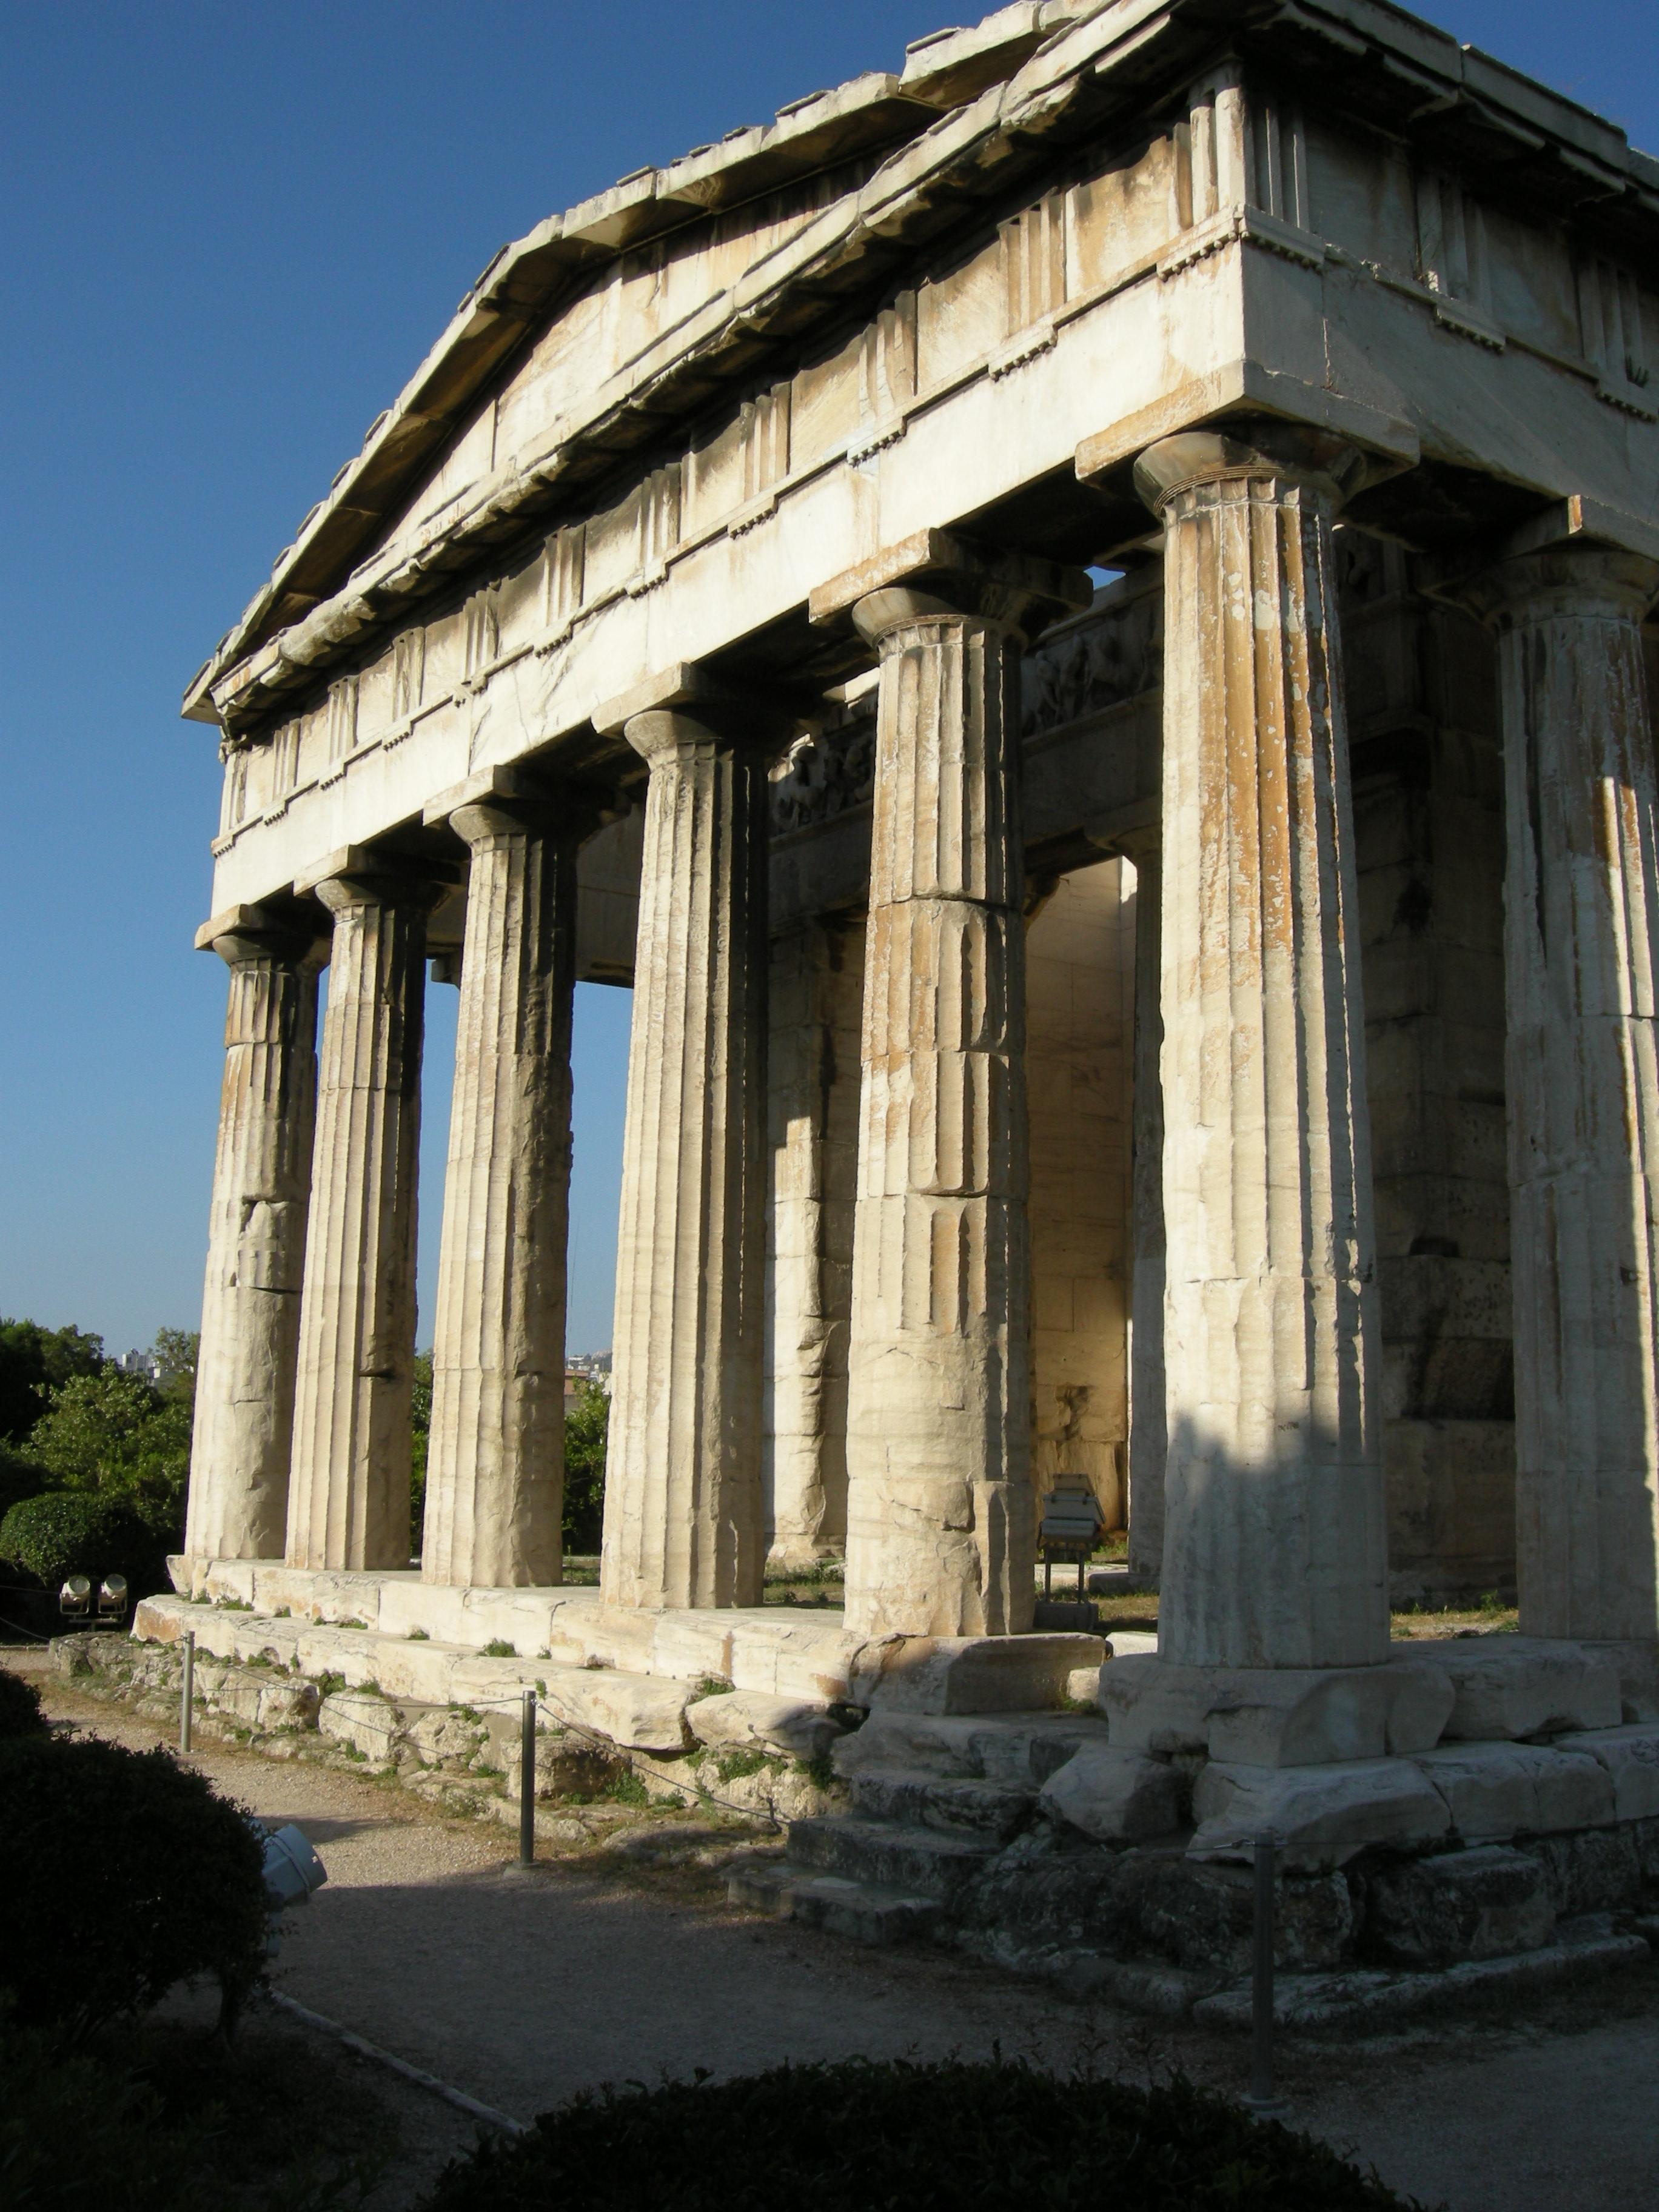 resourcesforhistoryteachers - AncientCivilizations